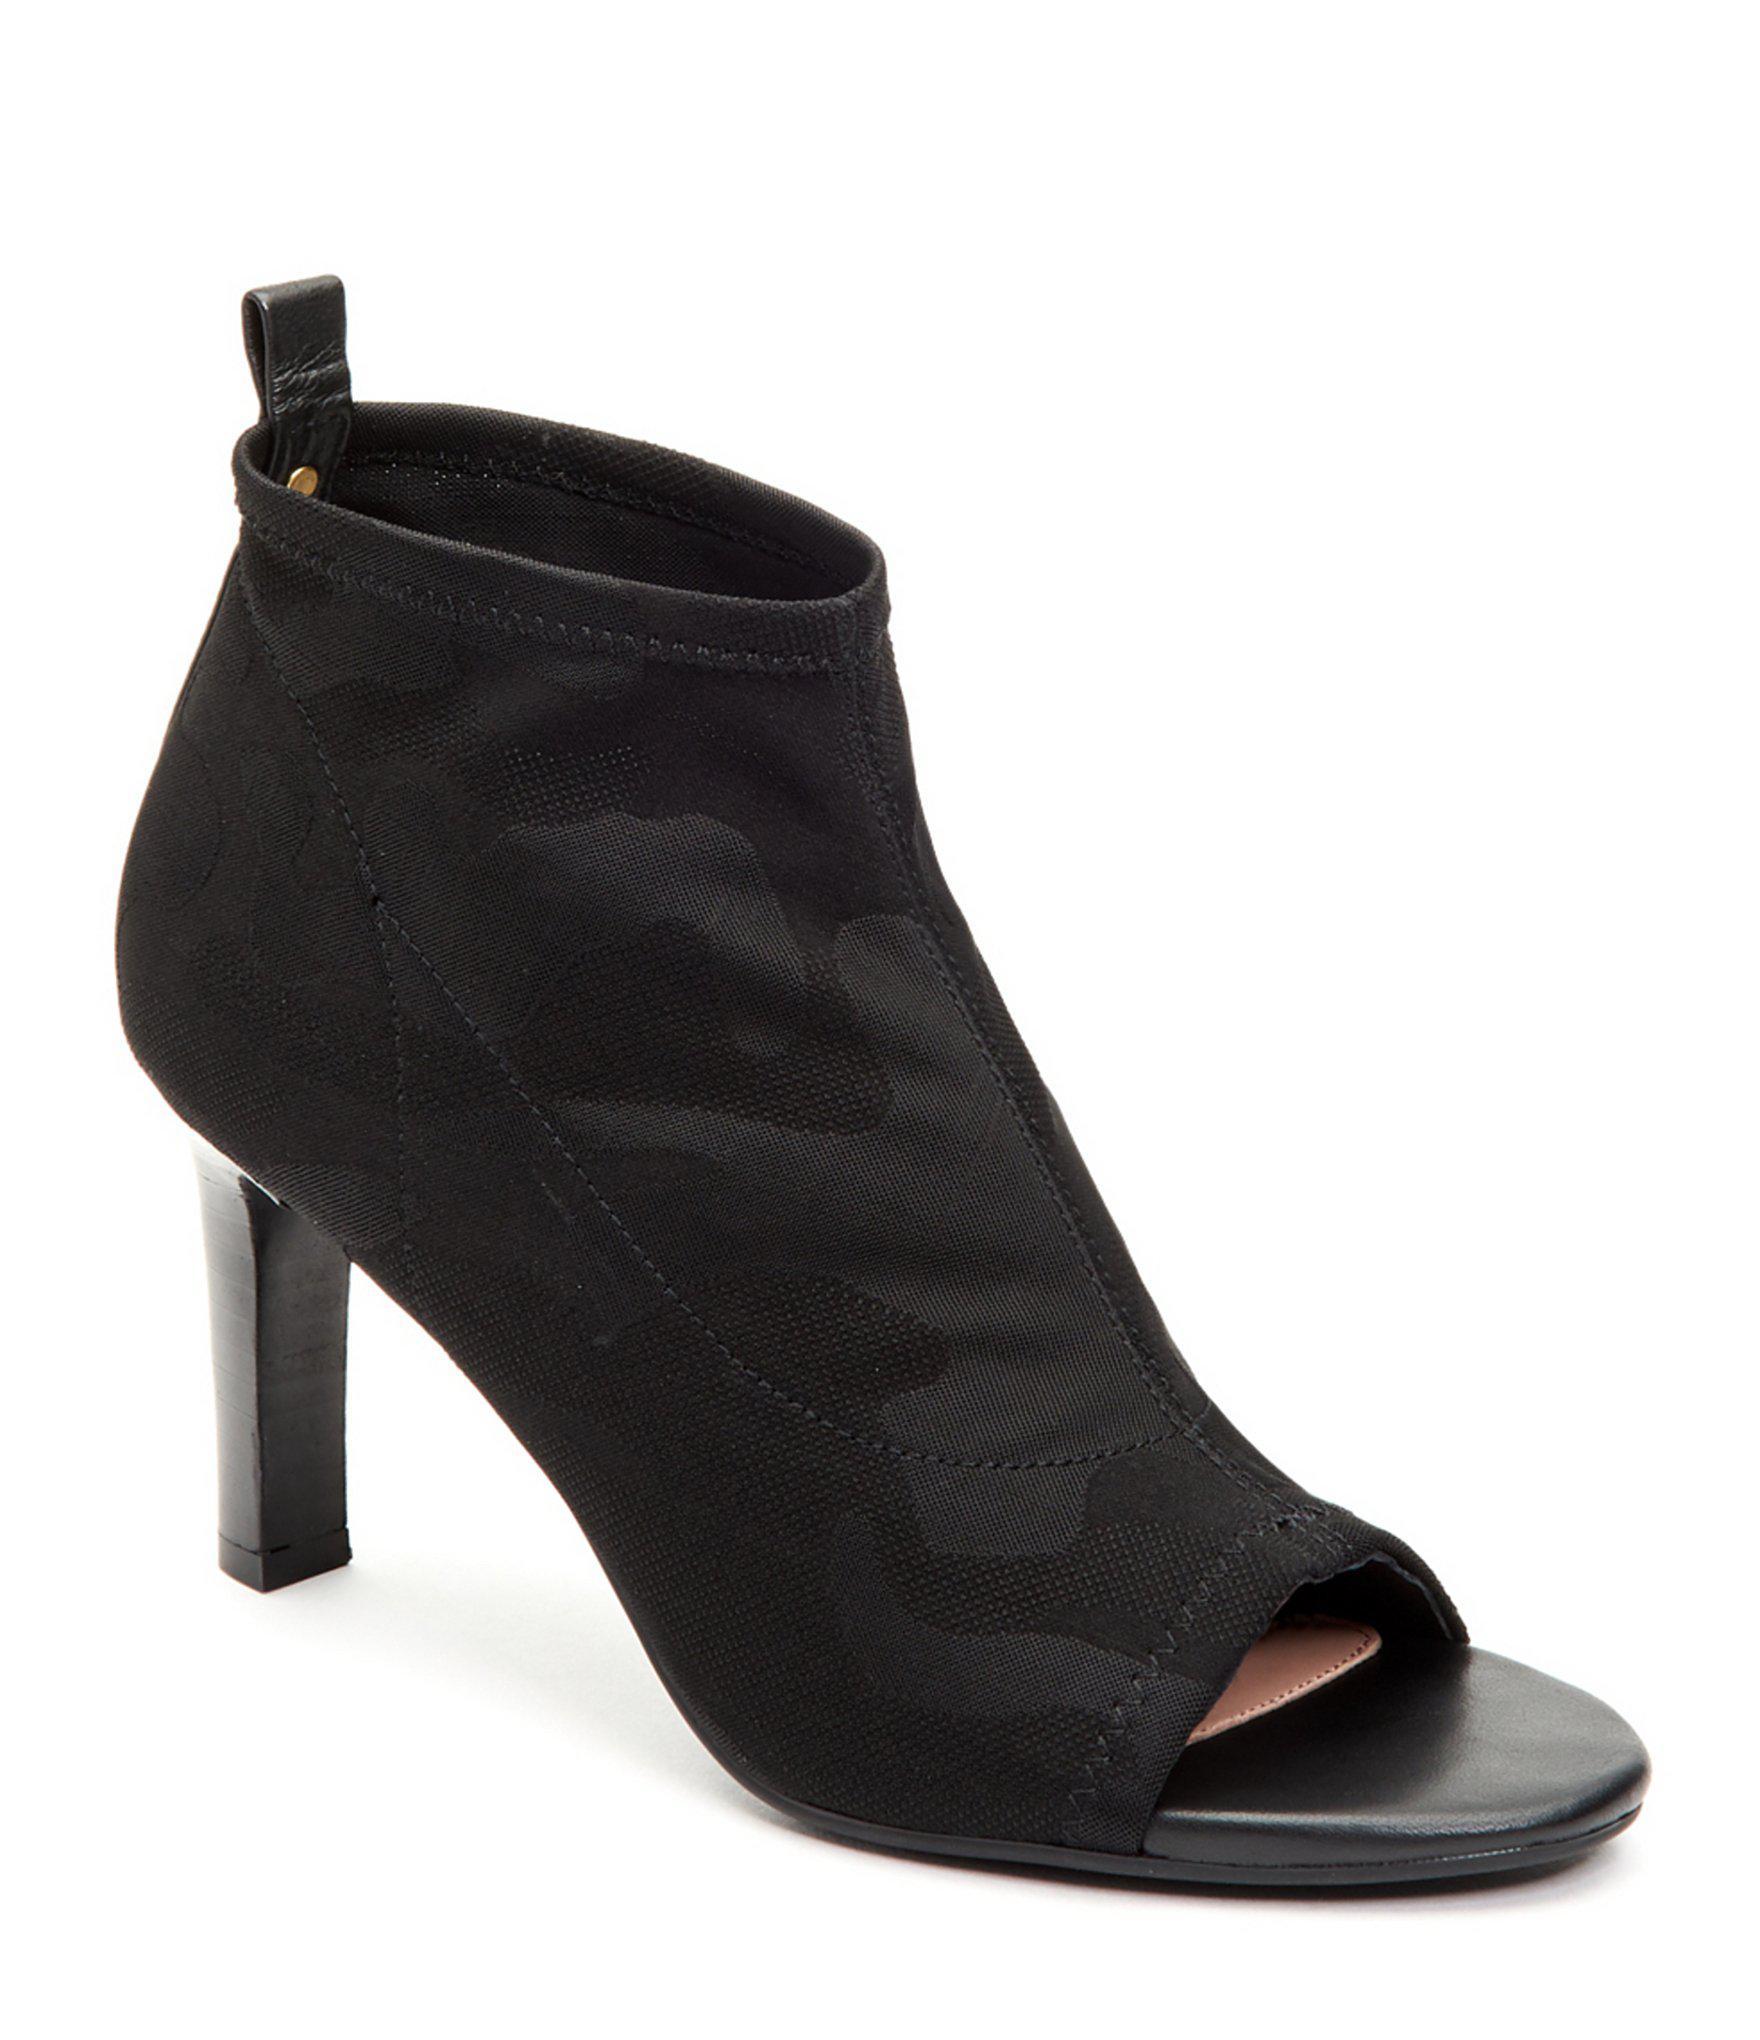 6851db9e77d9 Lyst - Taryn Rose Helene Camo Jacquard Booties in Black - Save 30%